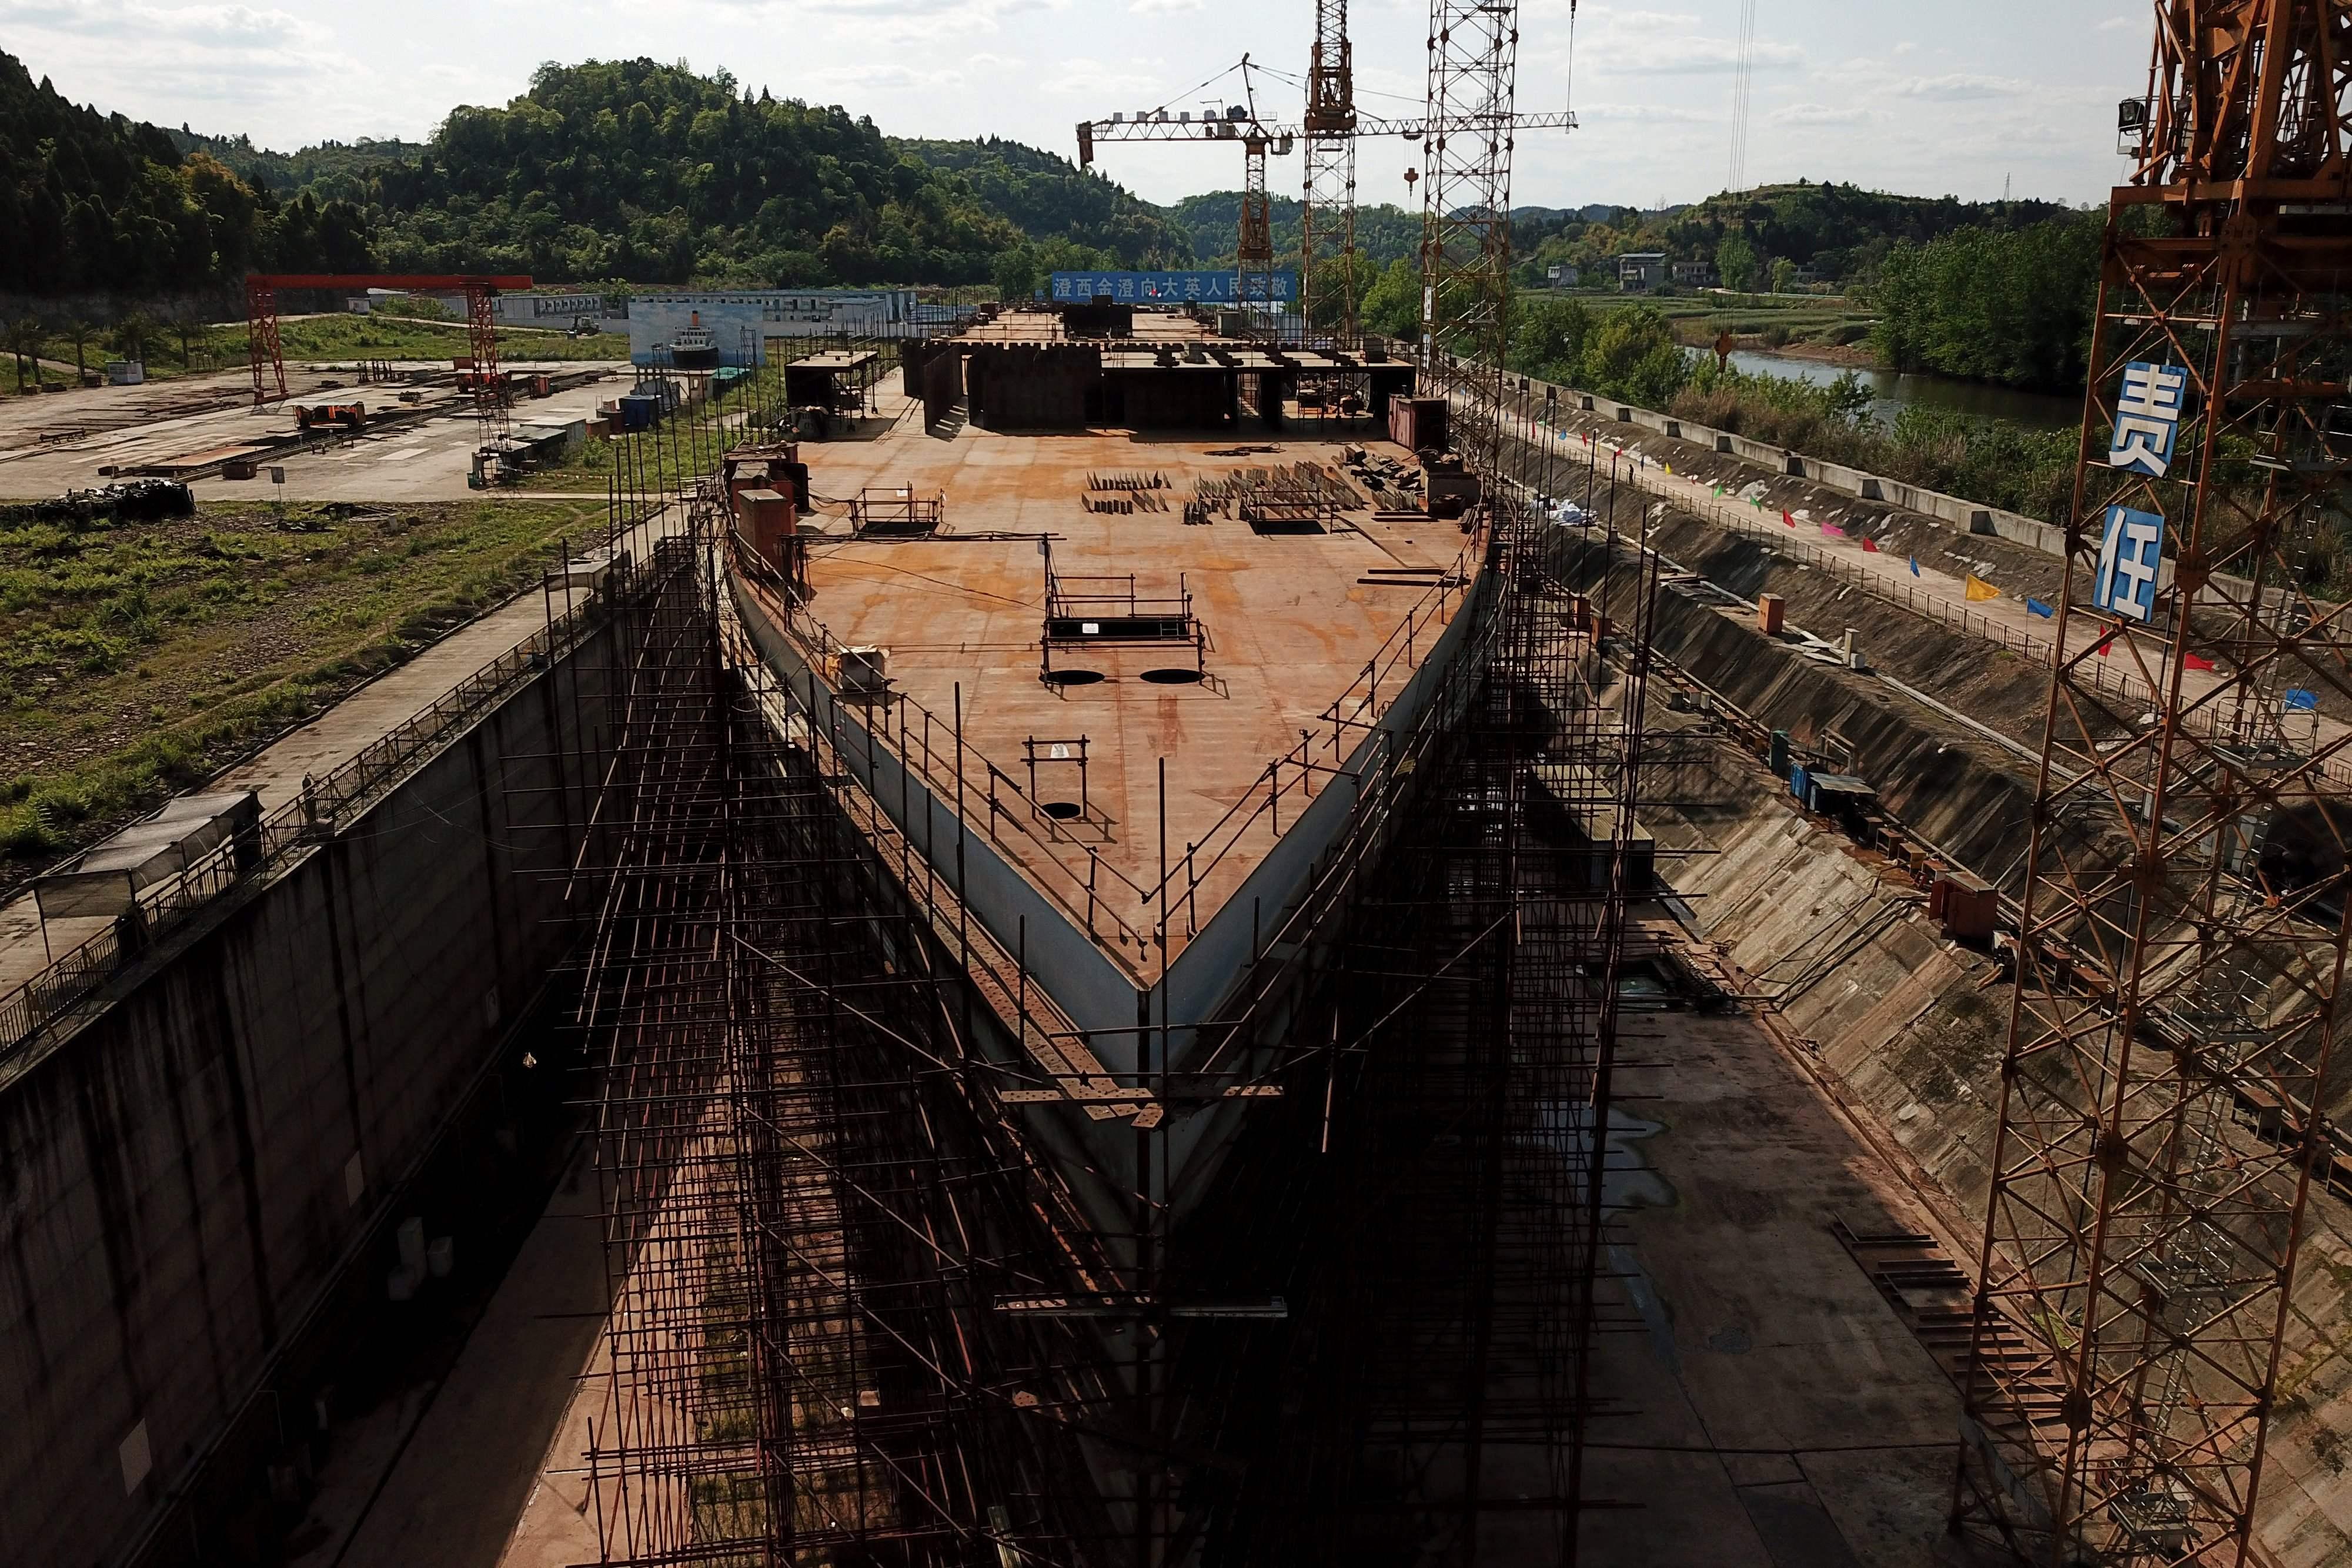 Foto aérea de la réplica del Titanic, en construcción.